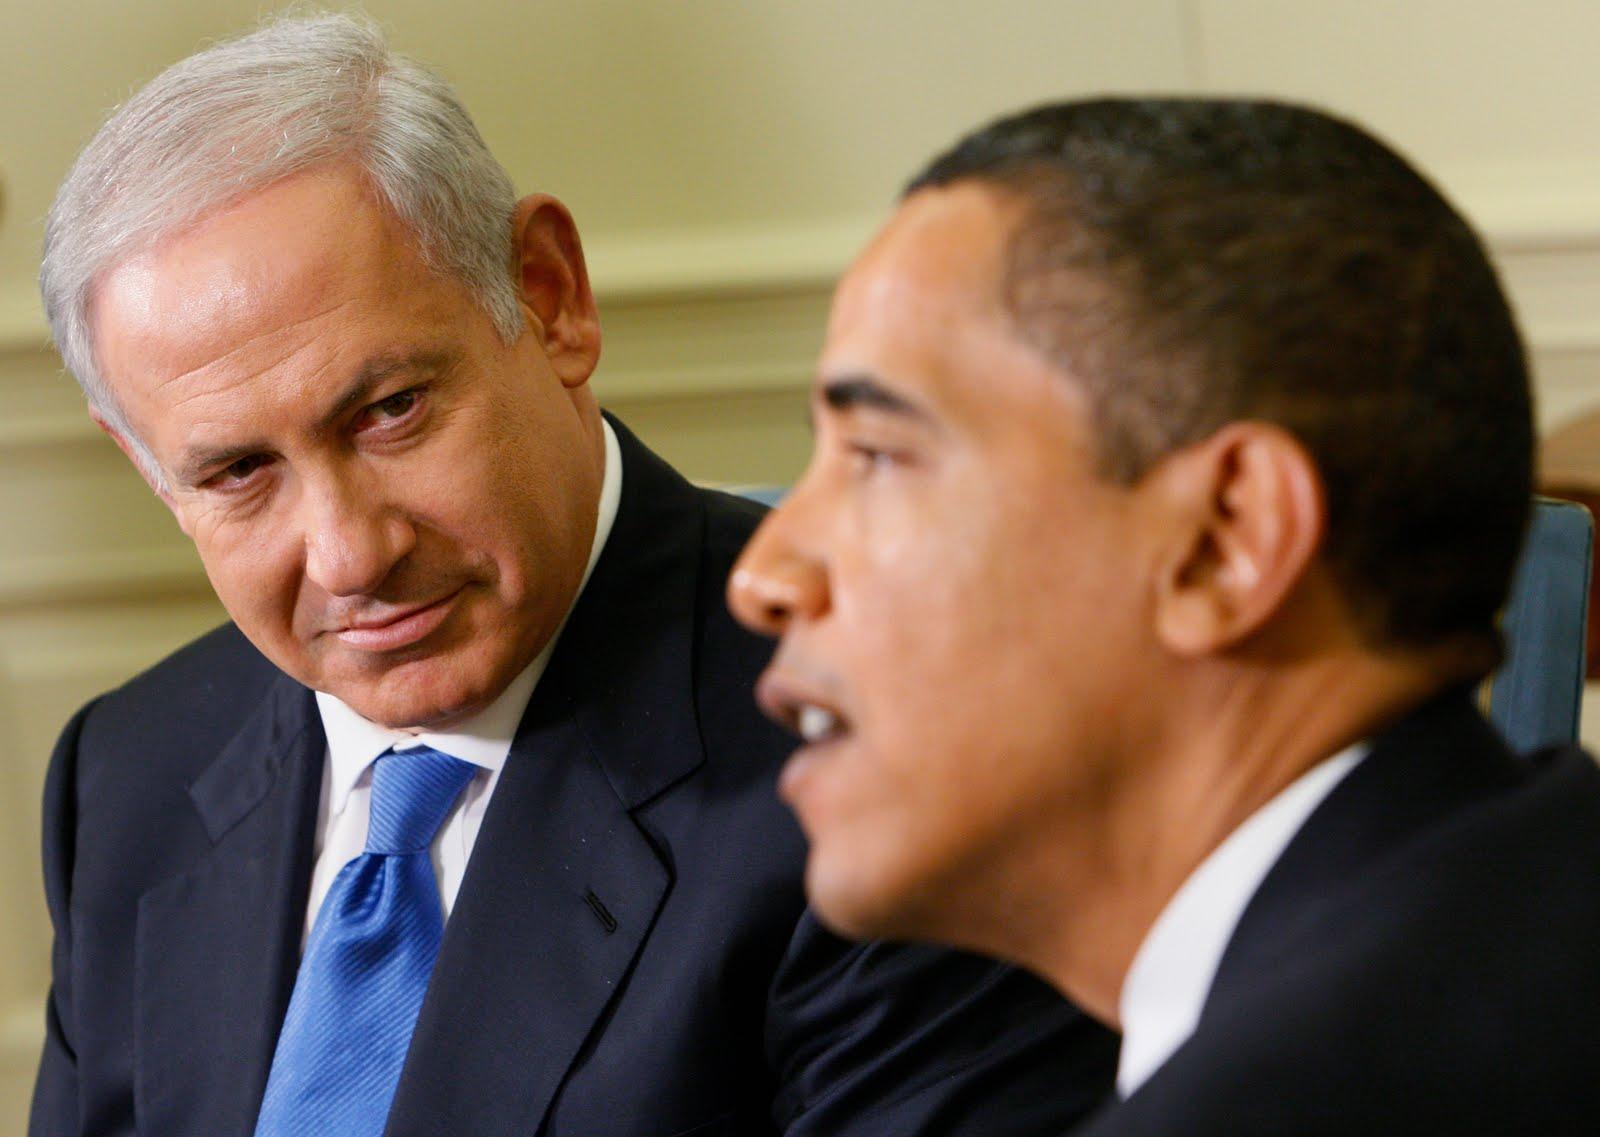 https://i1.wp.com/www.algemeiner.com/wp-content/uploads/2011/08/obama-netanyahu-2.jpg